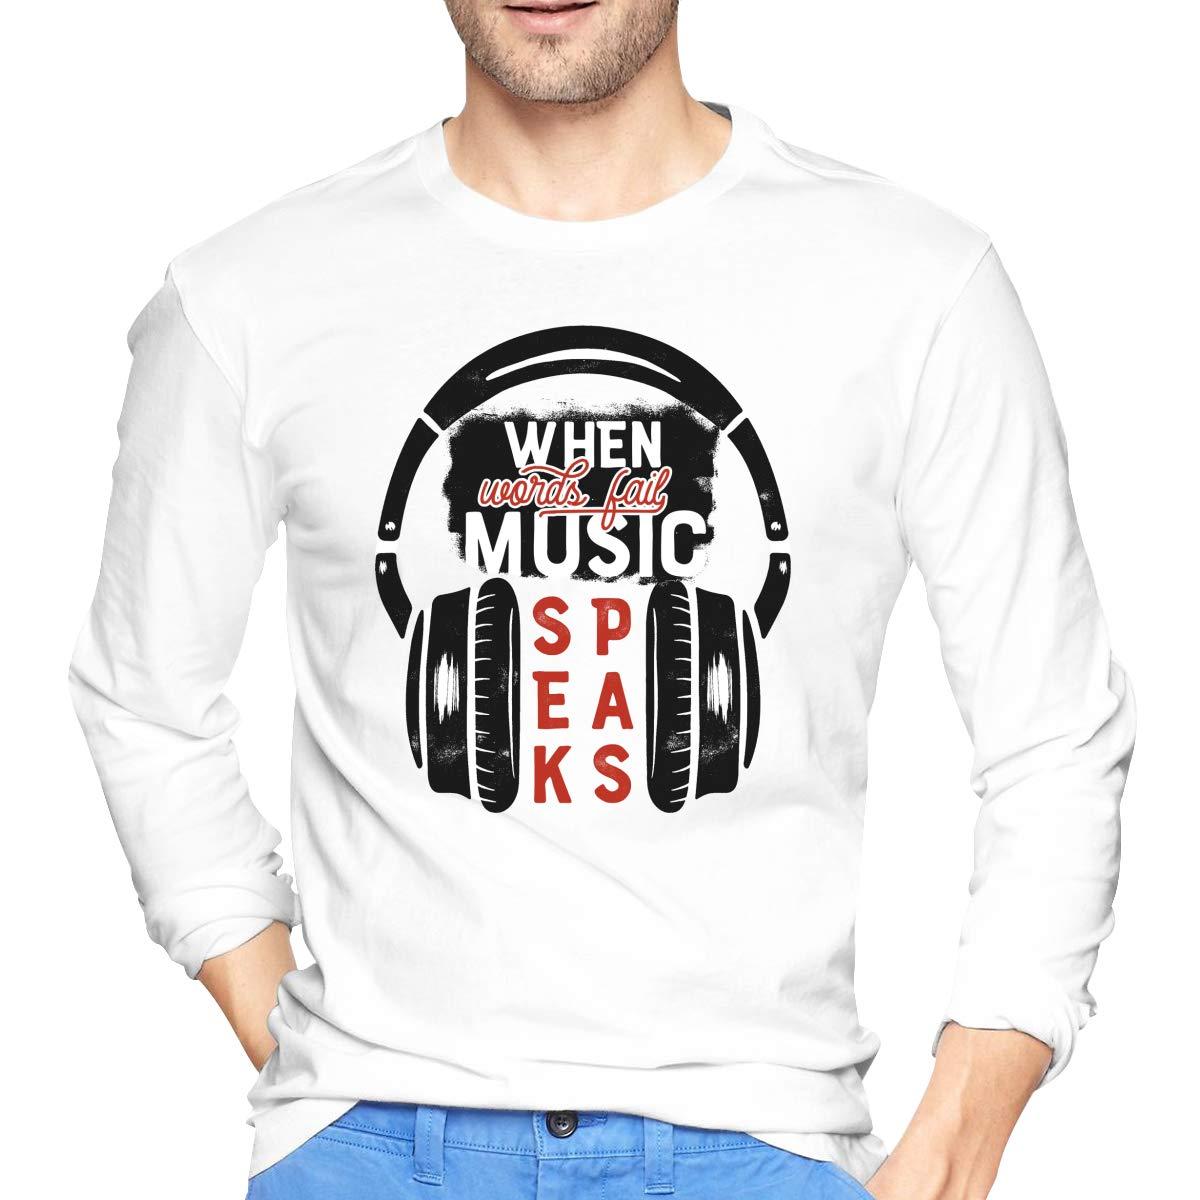 LONGTENG Designed T Shirt Music Speaks Fashion T Shirts O-Neck 100/% Cotton for Boys Black